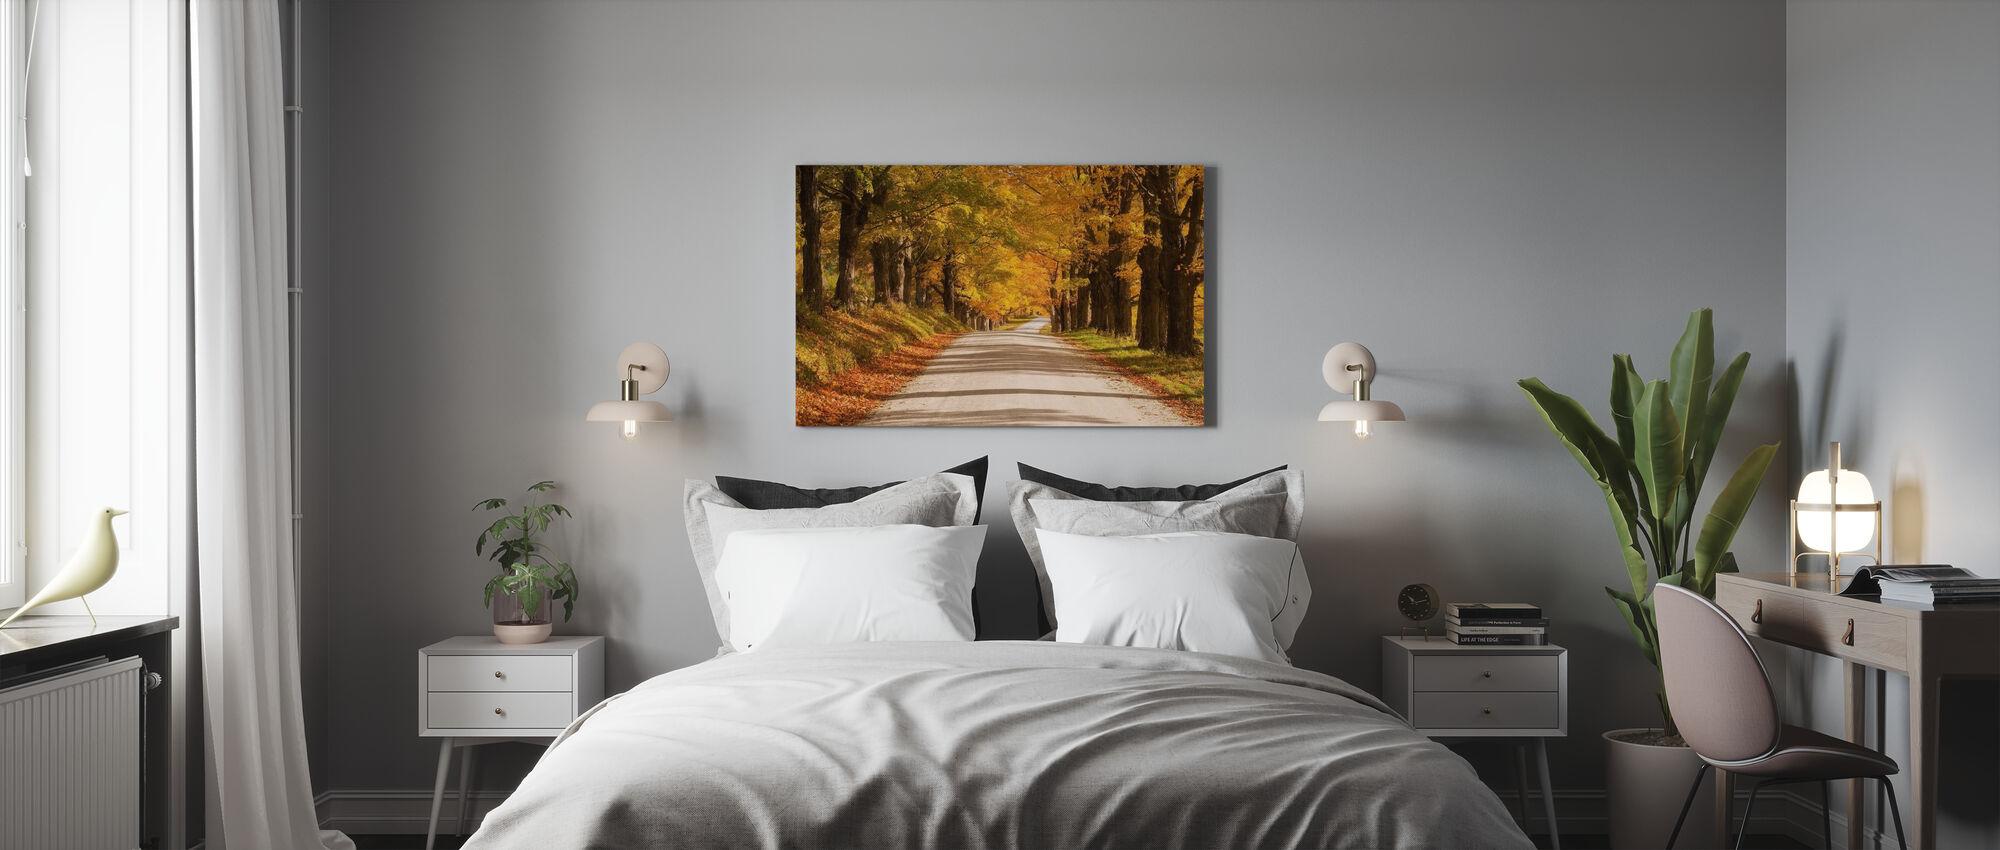 Baldachin aus Ahorn - Leinwandbild - Schlafzimmer